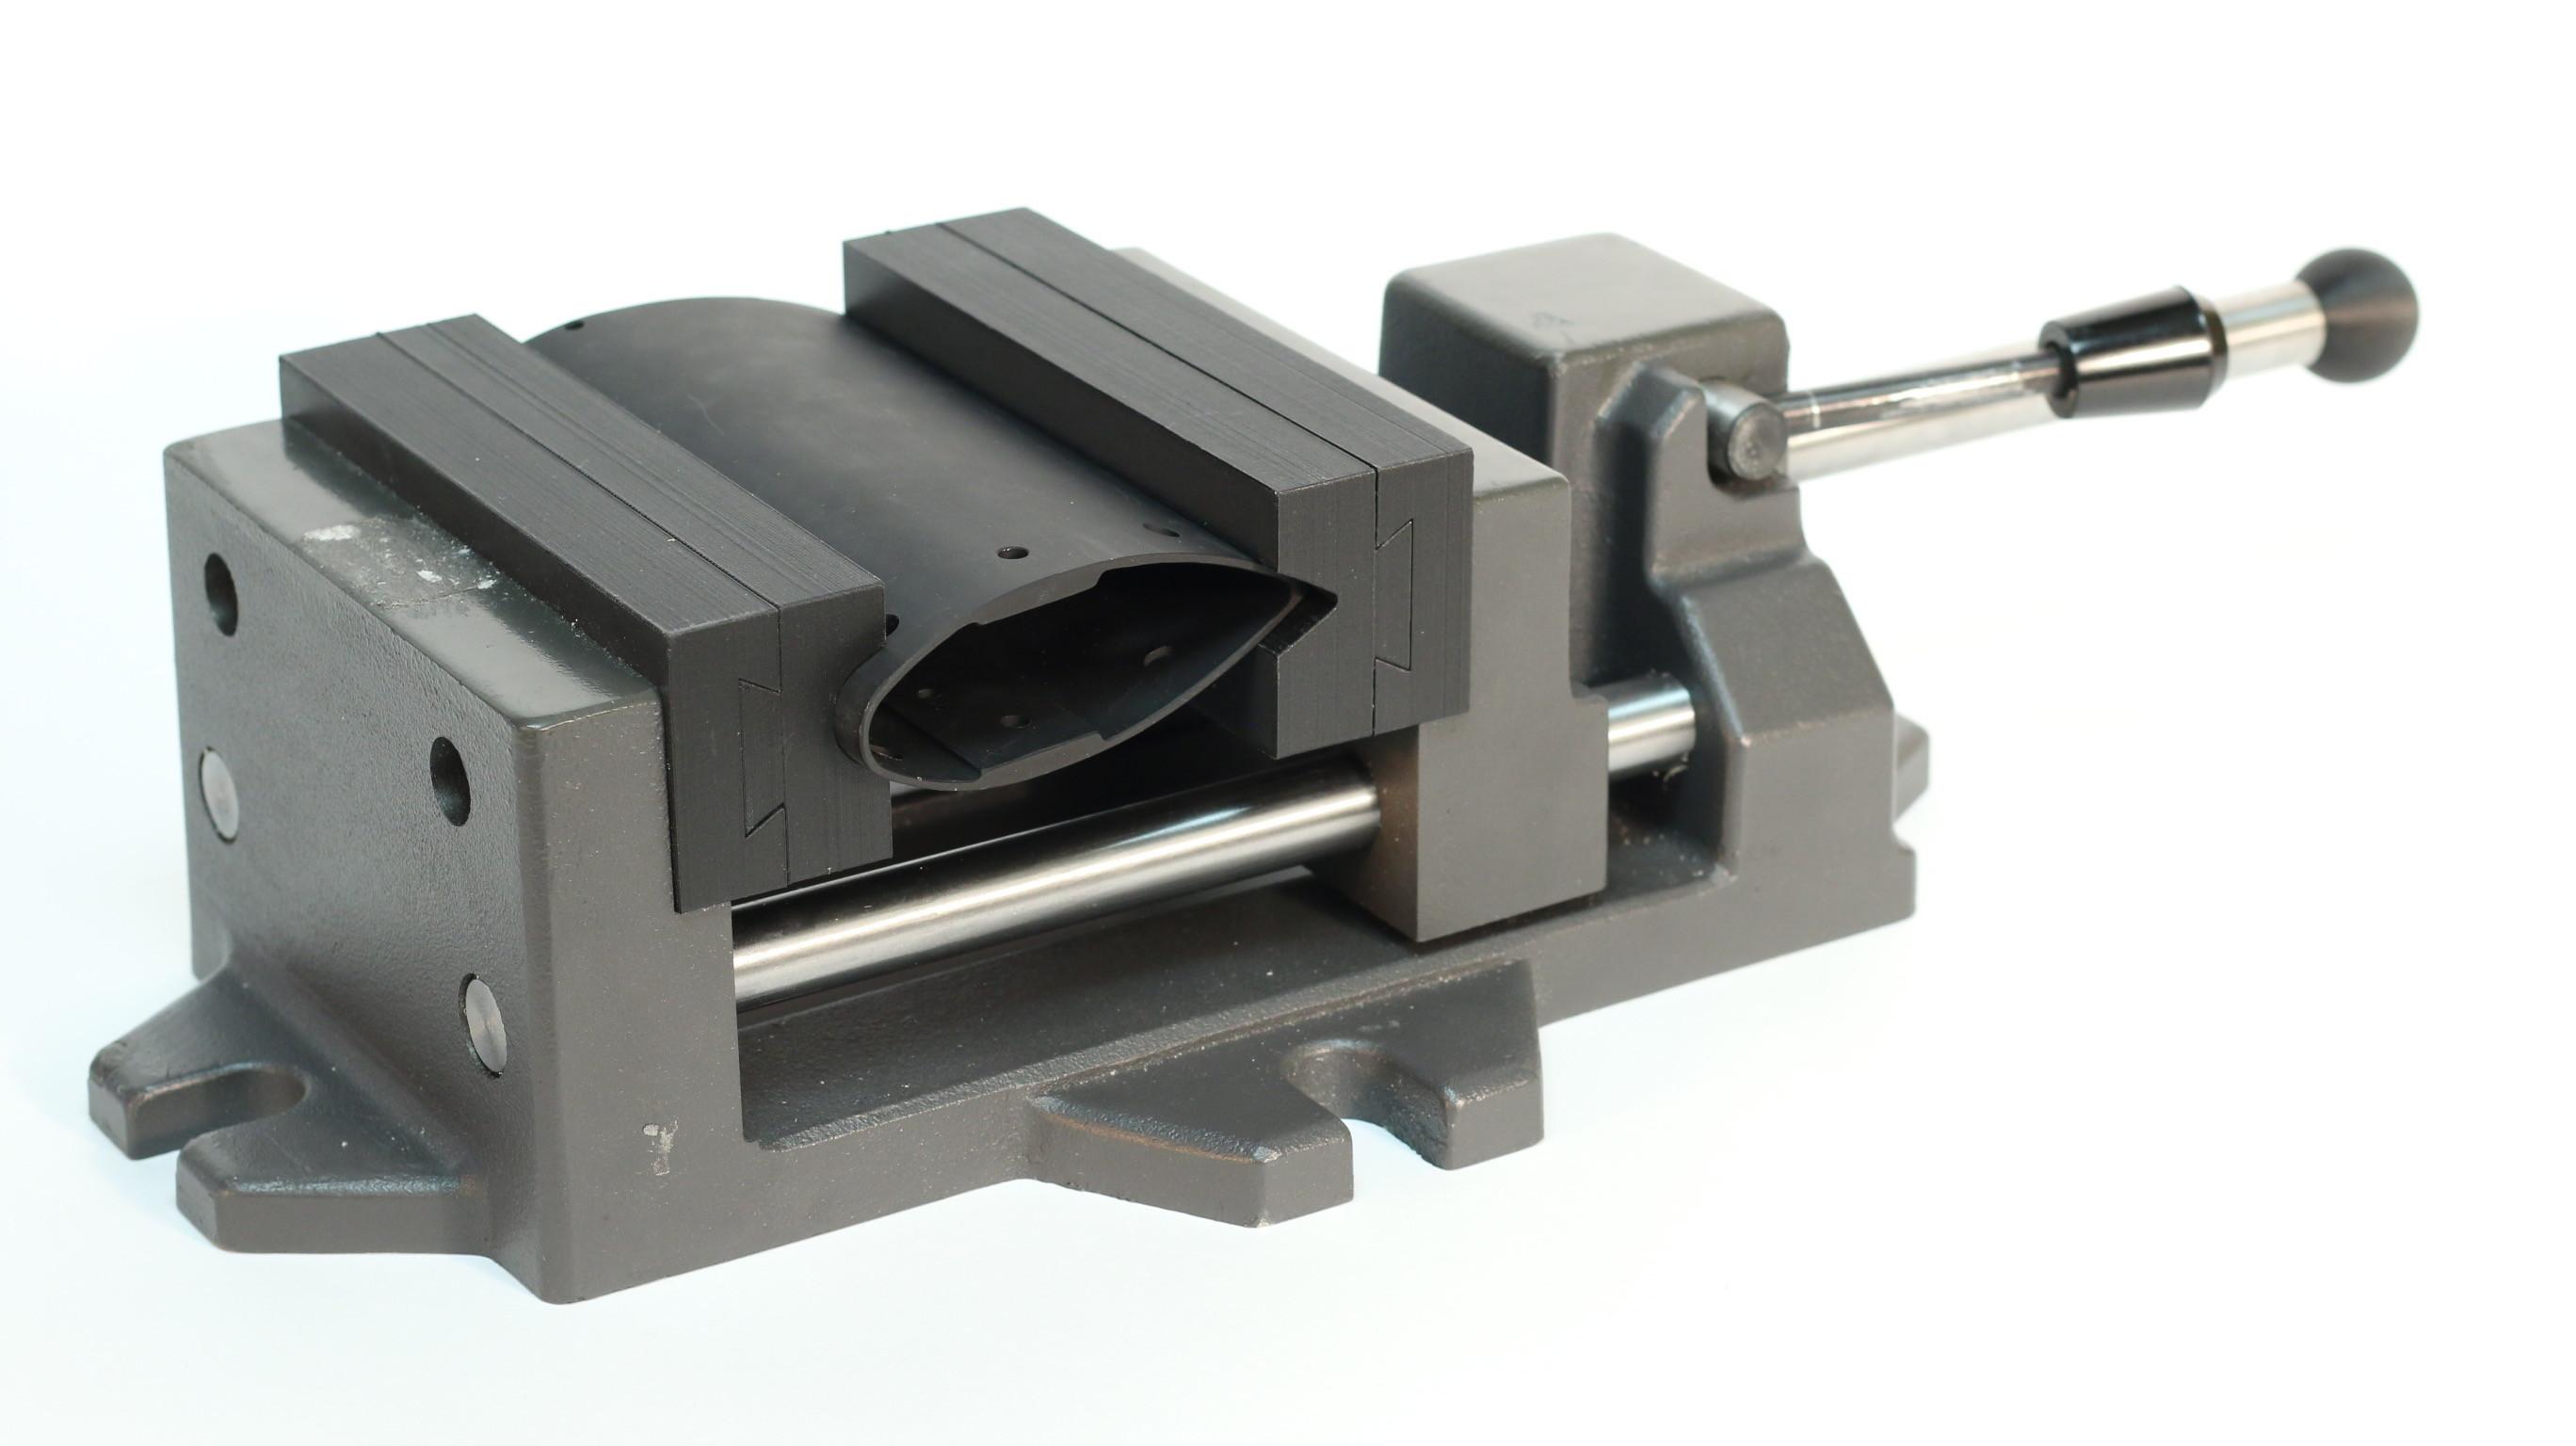 Markforged Onyx One Carbon Fiber 3D Printer